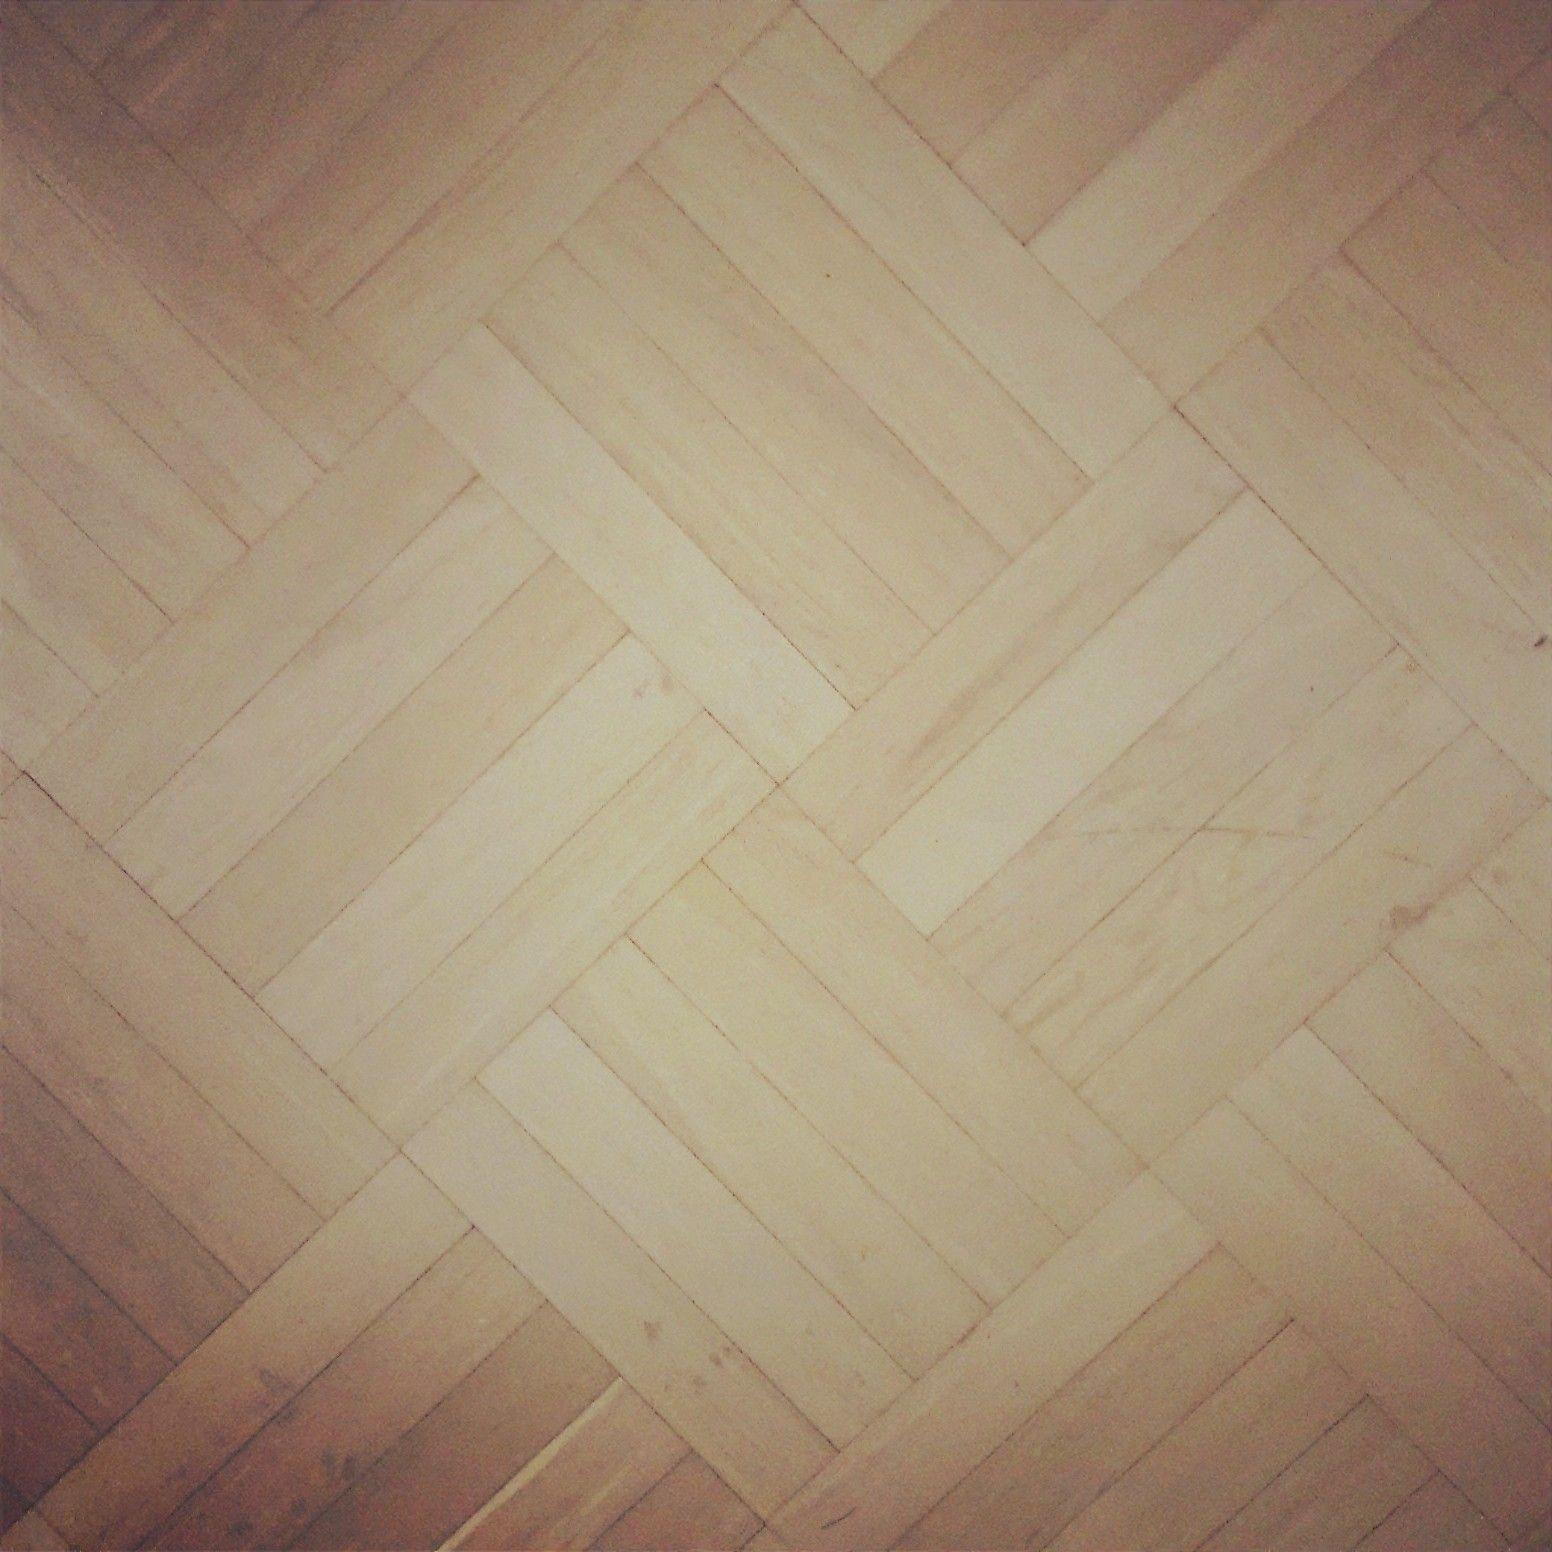 Ihana uusi/vanha lattia!